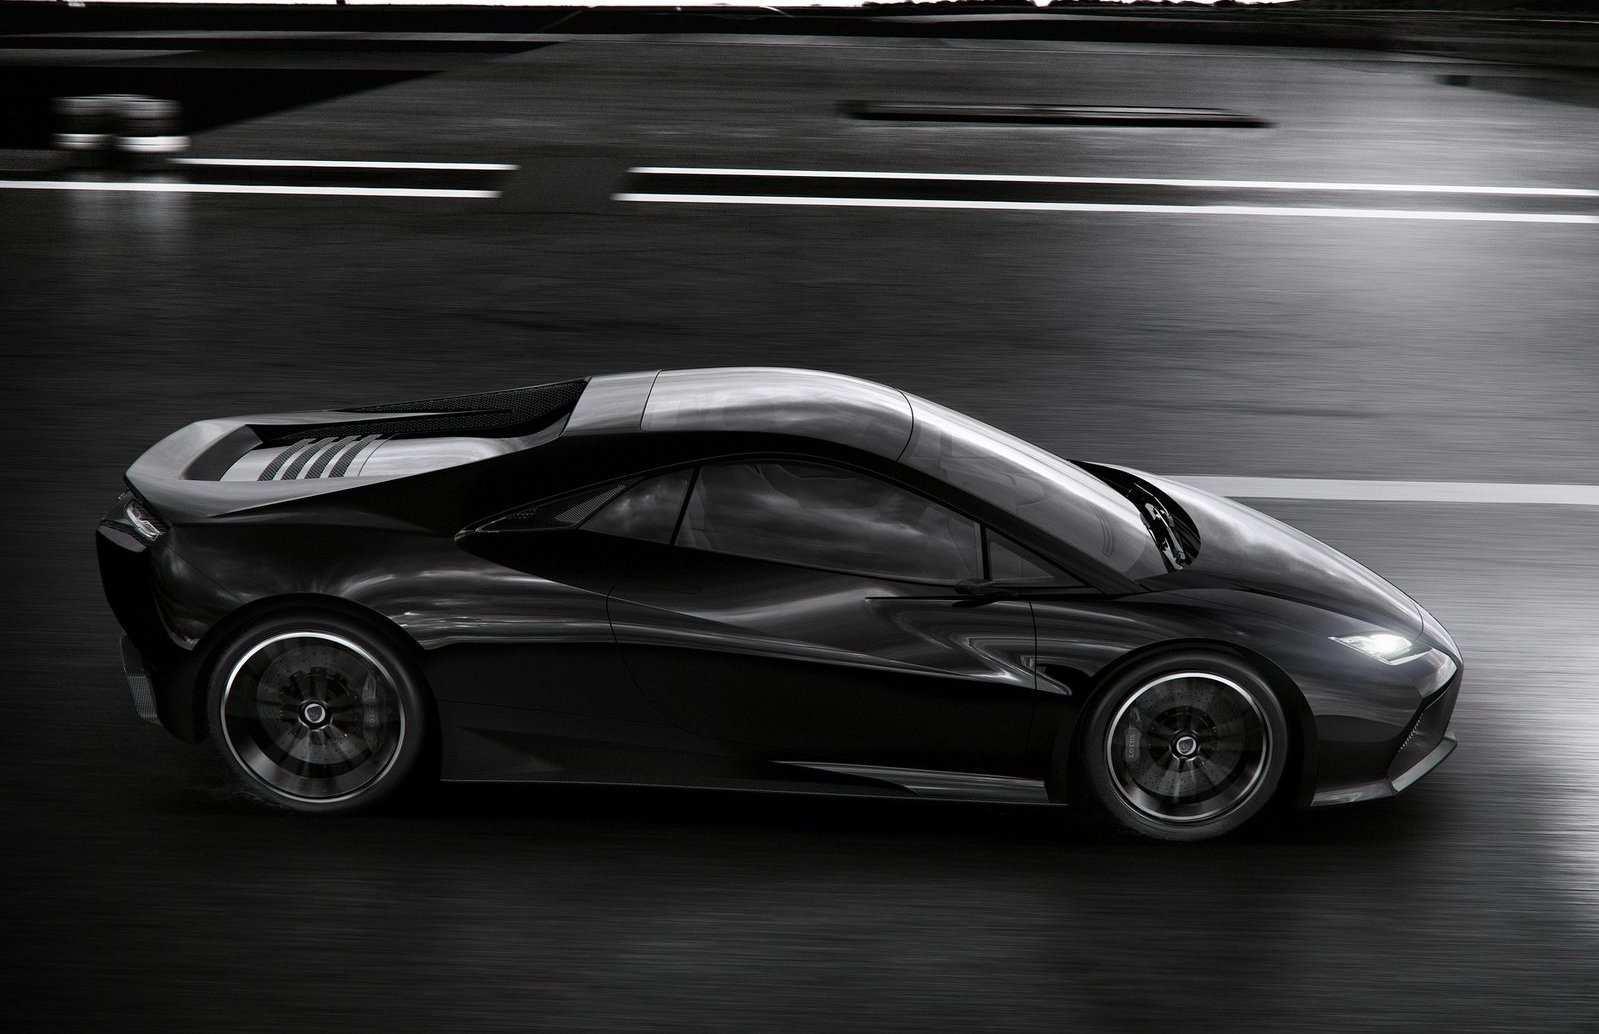 49 Best Review 2020 Lotus Esprit Spesification for 2020 Lotus Esprit